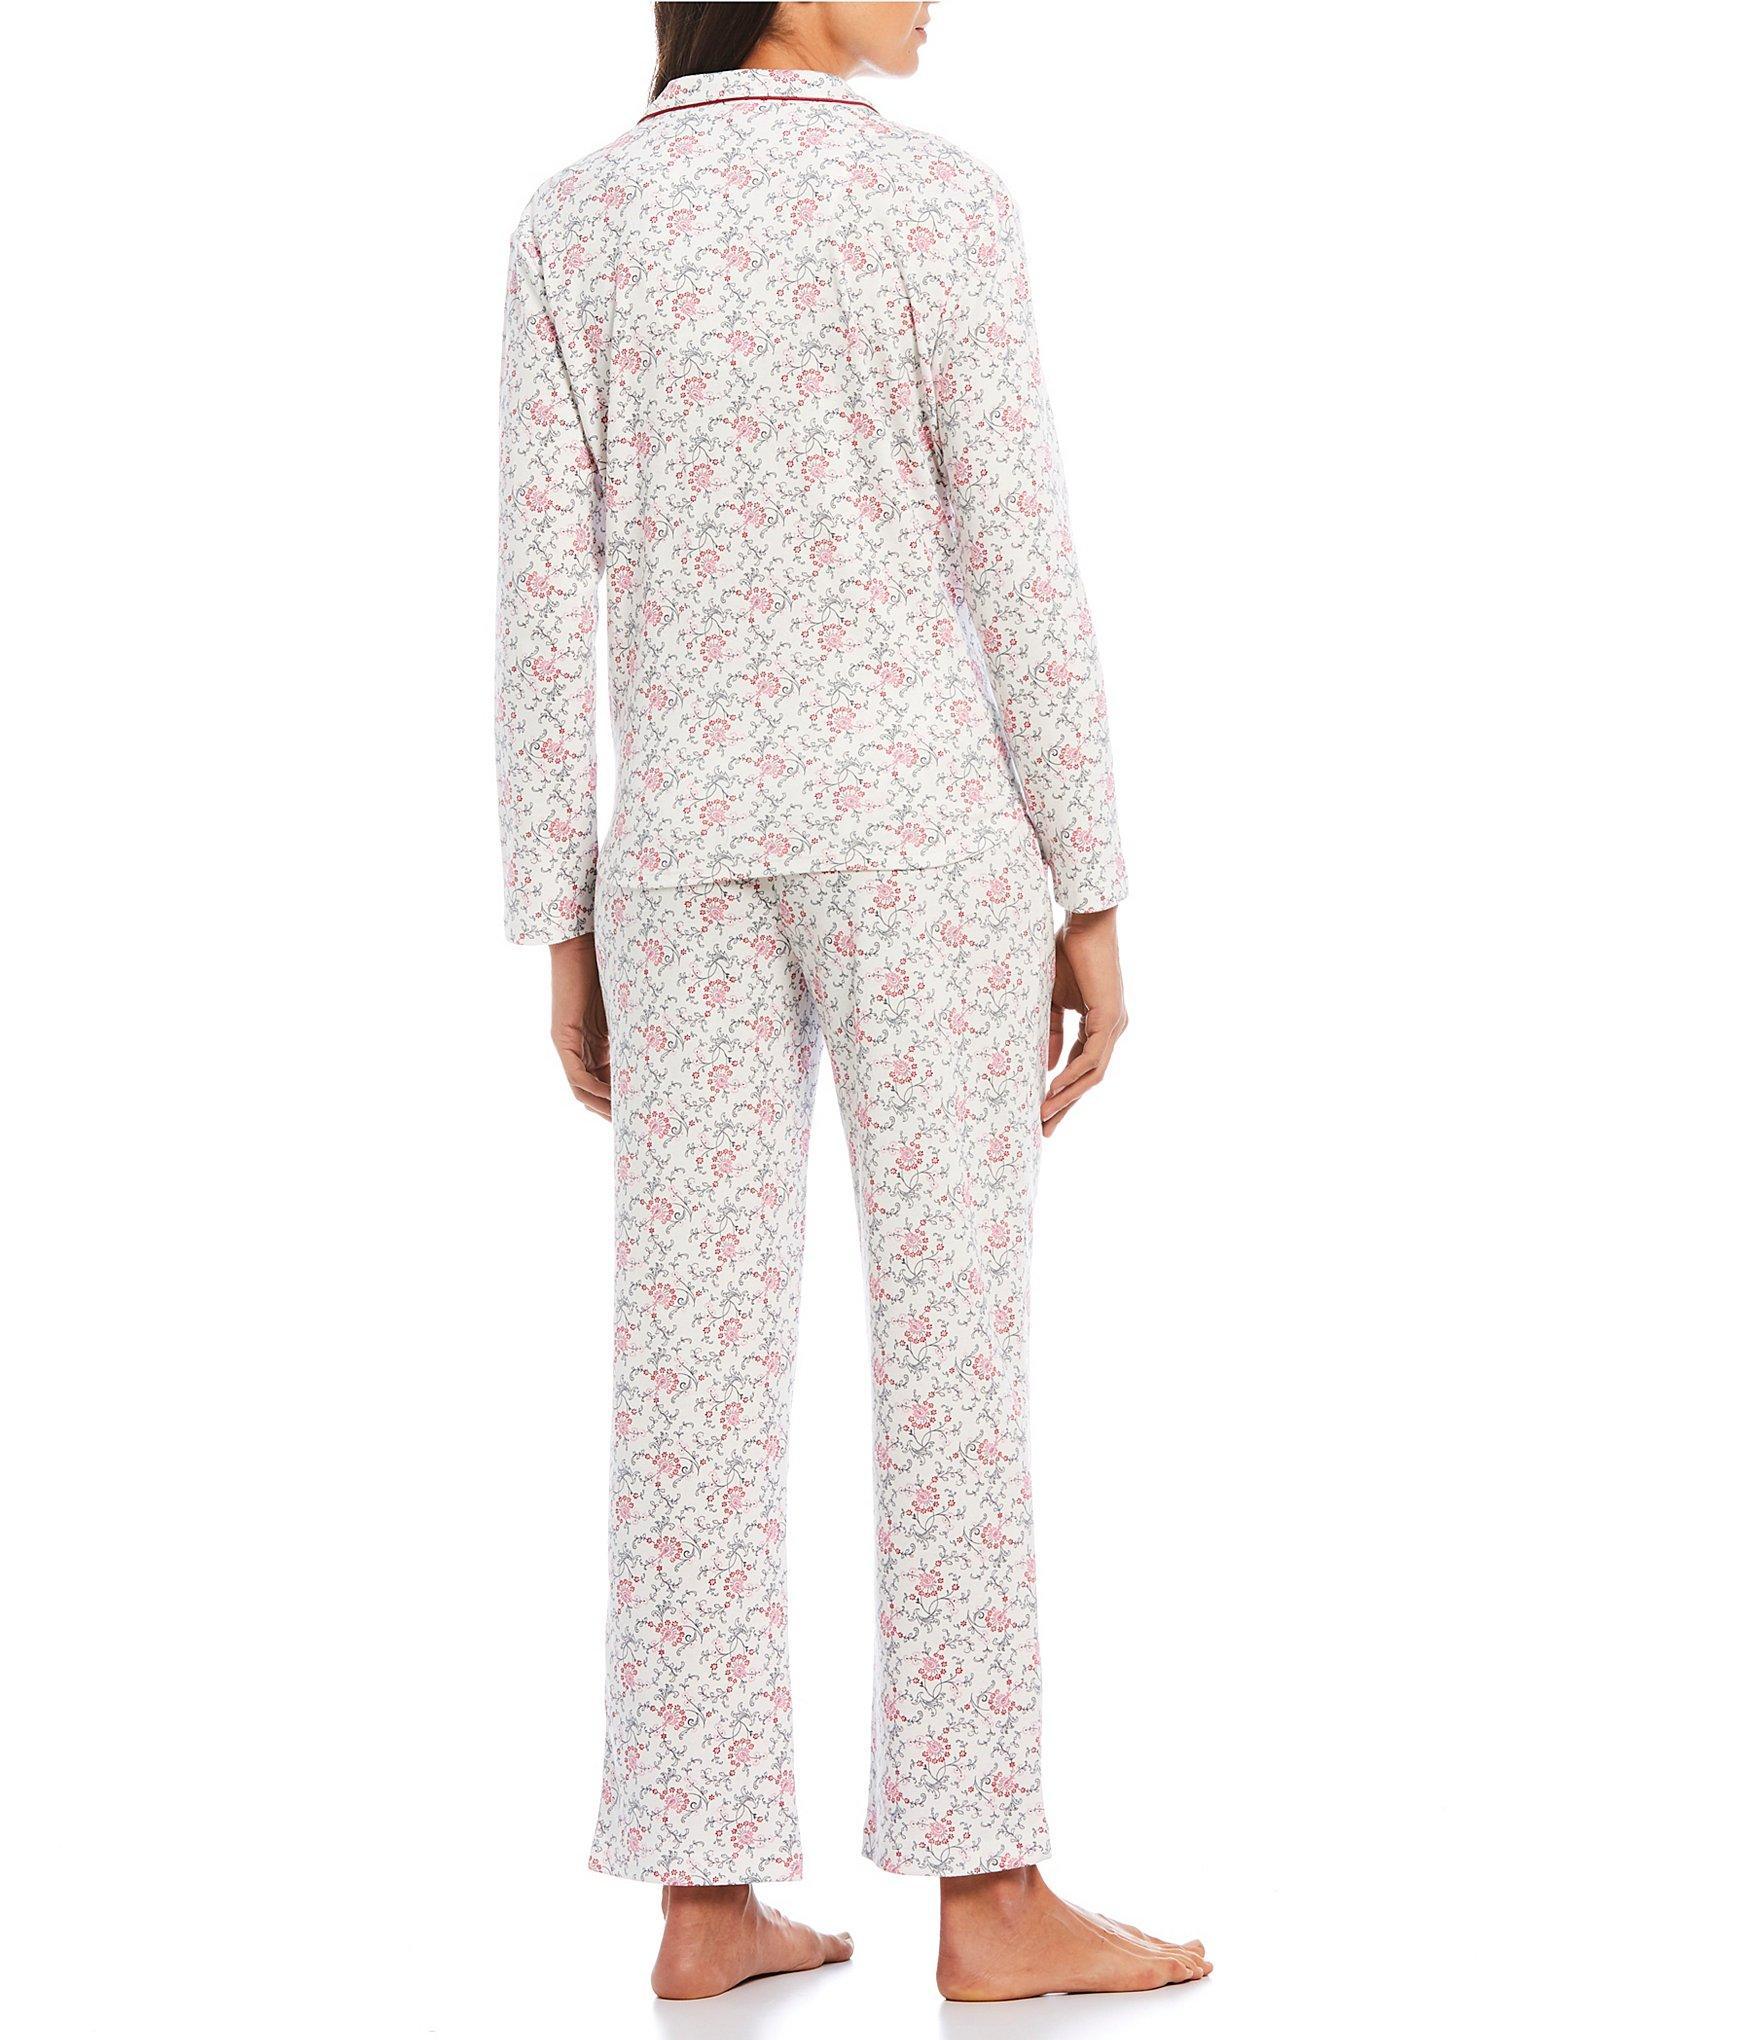 KAREN NEUBURGER Soft Cotton PYJAMA BOTTOMS Lounger Pants PURPLE Multi Plaid